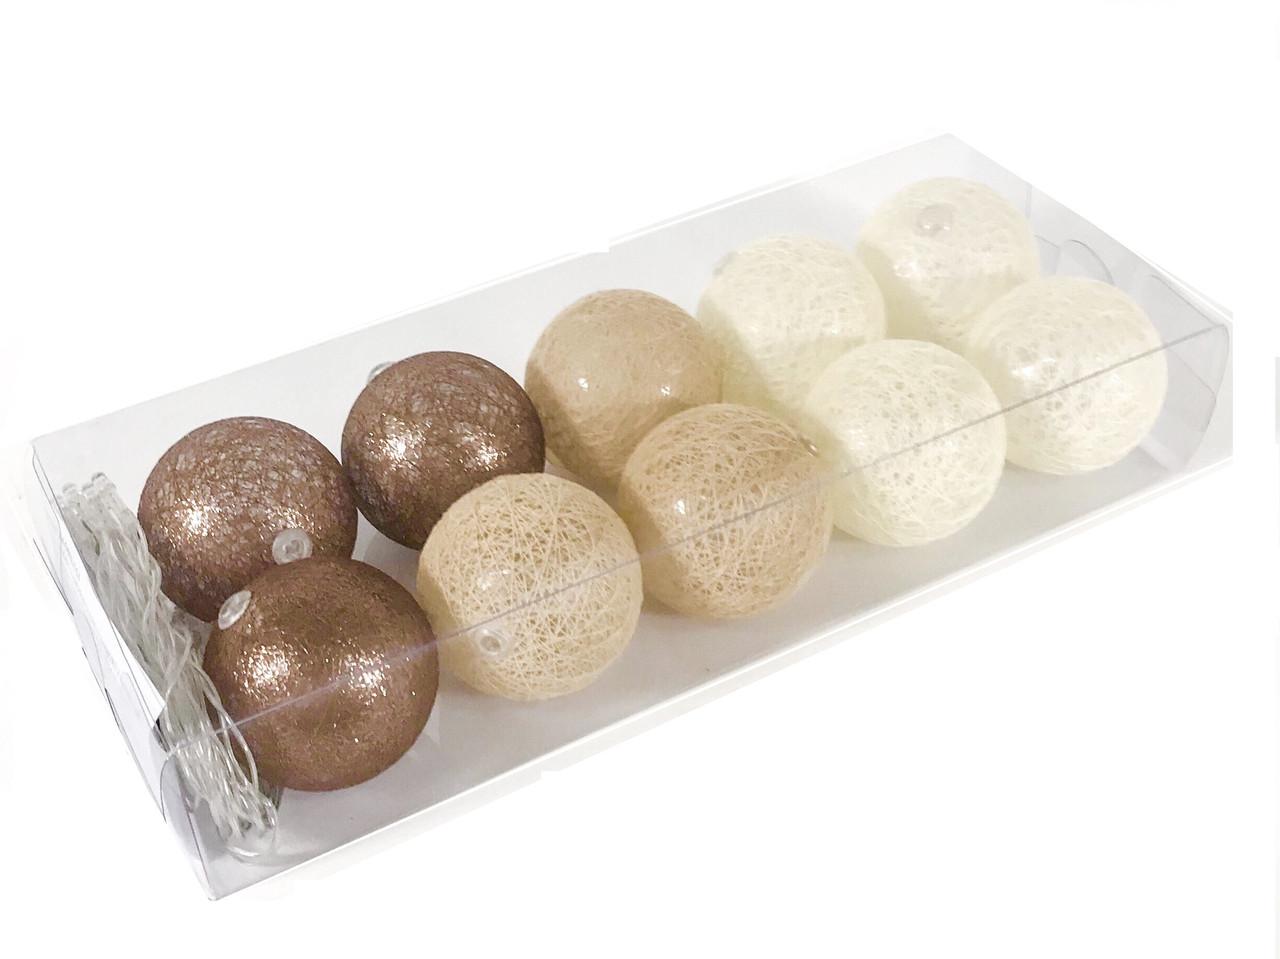 Гирлянда тайские шарики Liryc Cotton Balls 10led, диам 6см, длина 235см на батарейках АА